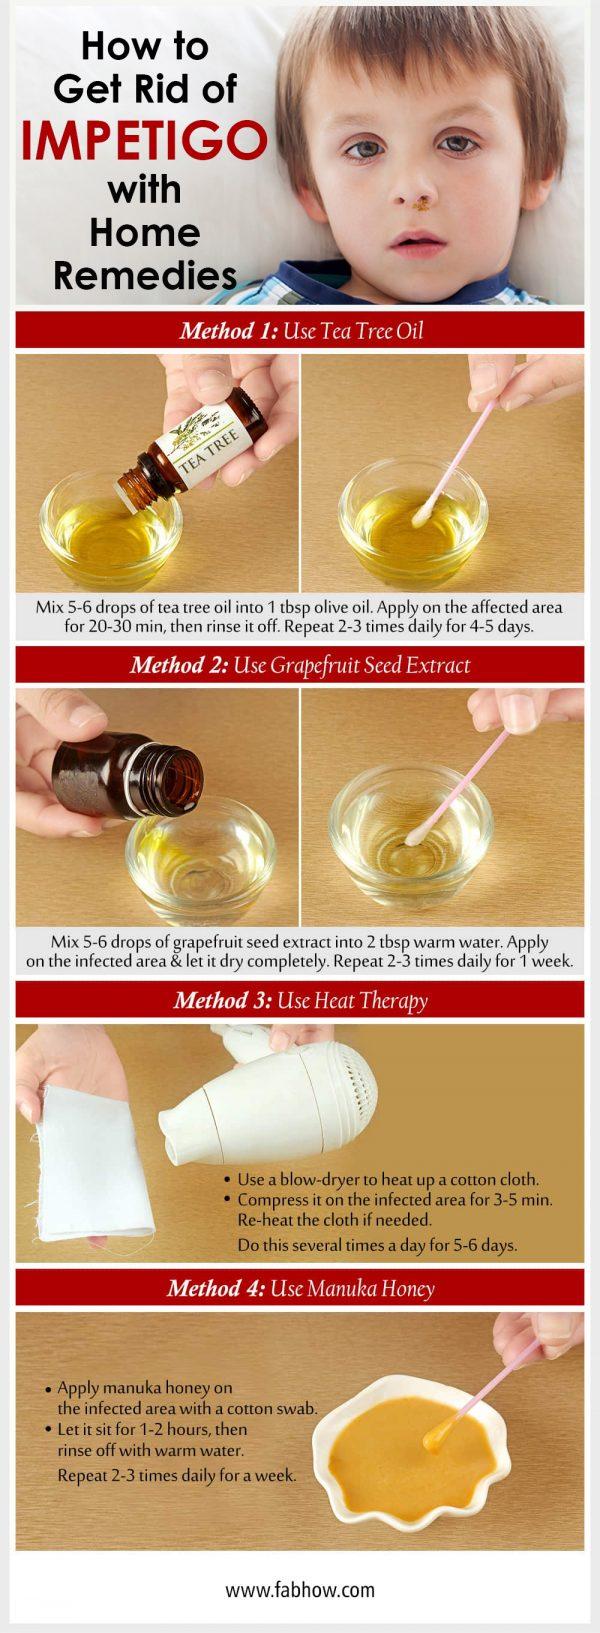 Get Rid of Impetigo with Home Remedies